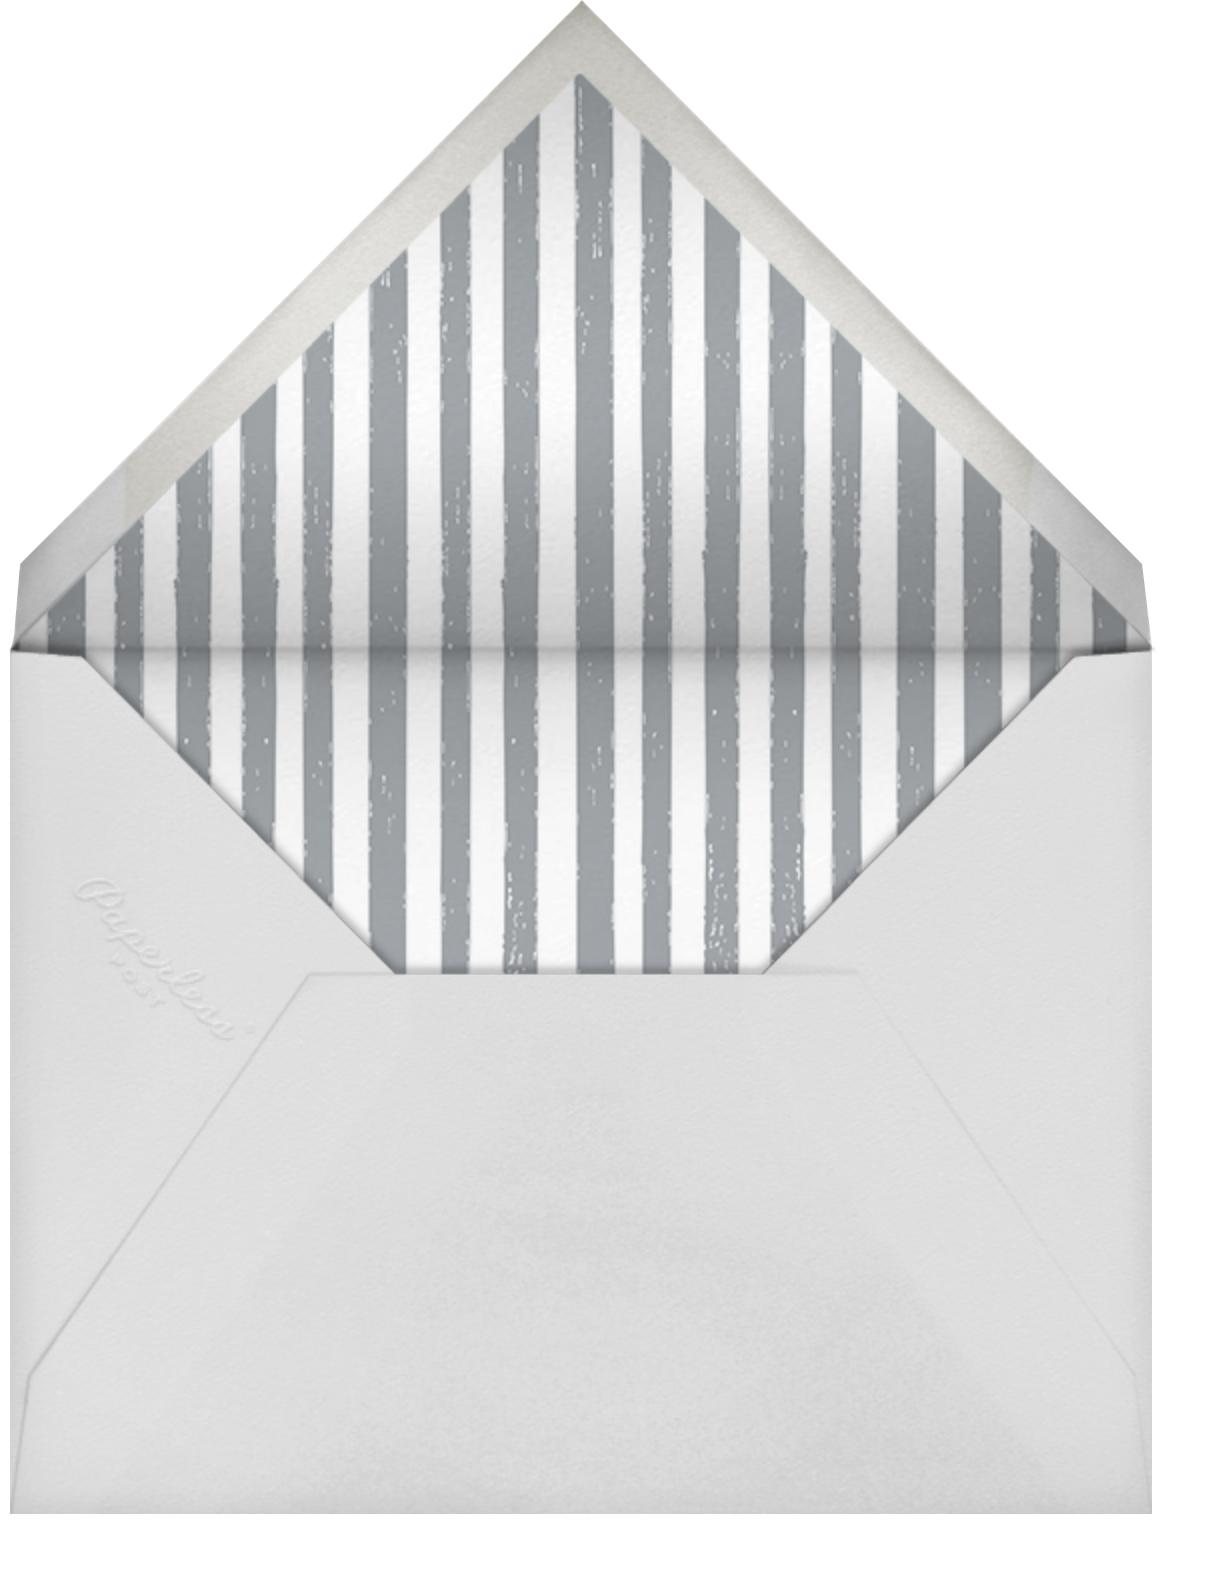 Endless Summer - Blue Bar Mitzvah - Mr. Boddington's Studio - Bar and bat mitzvah - envelope back